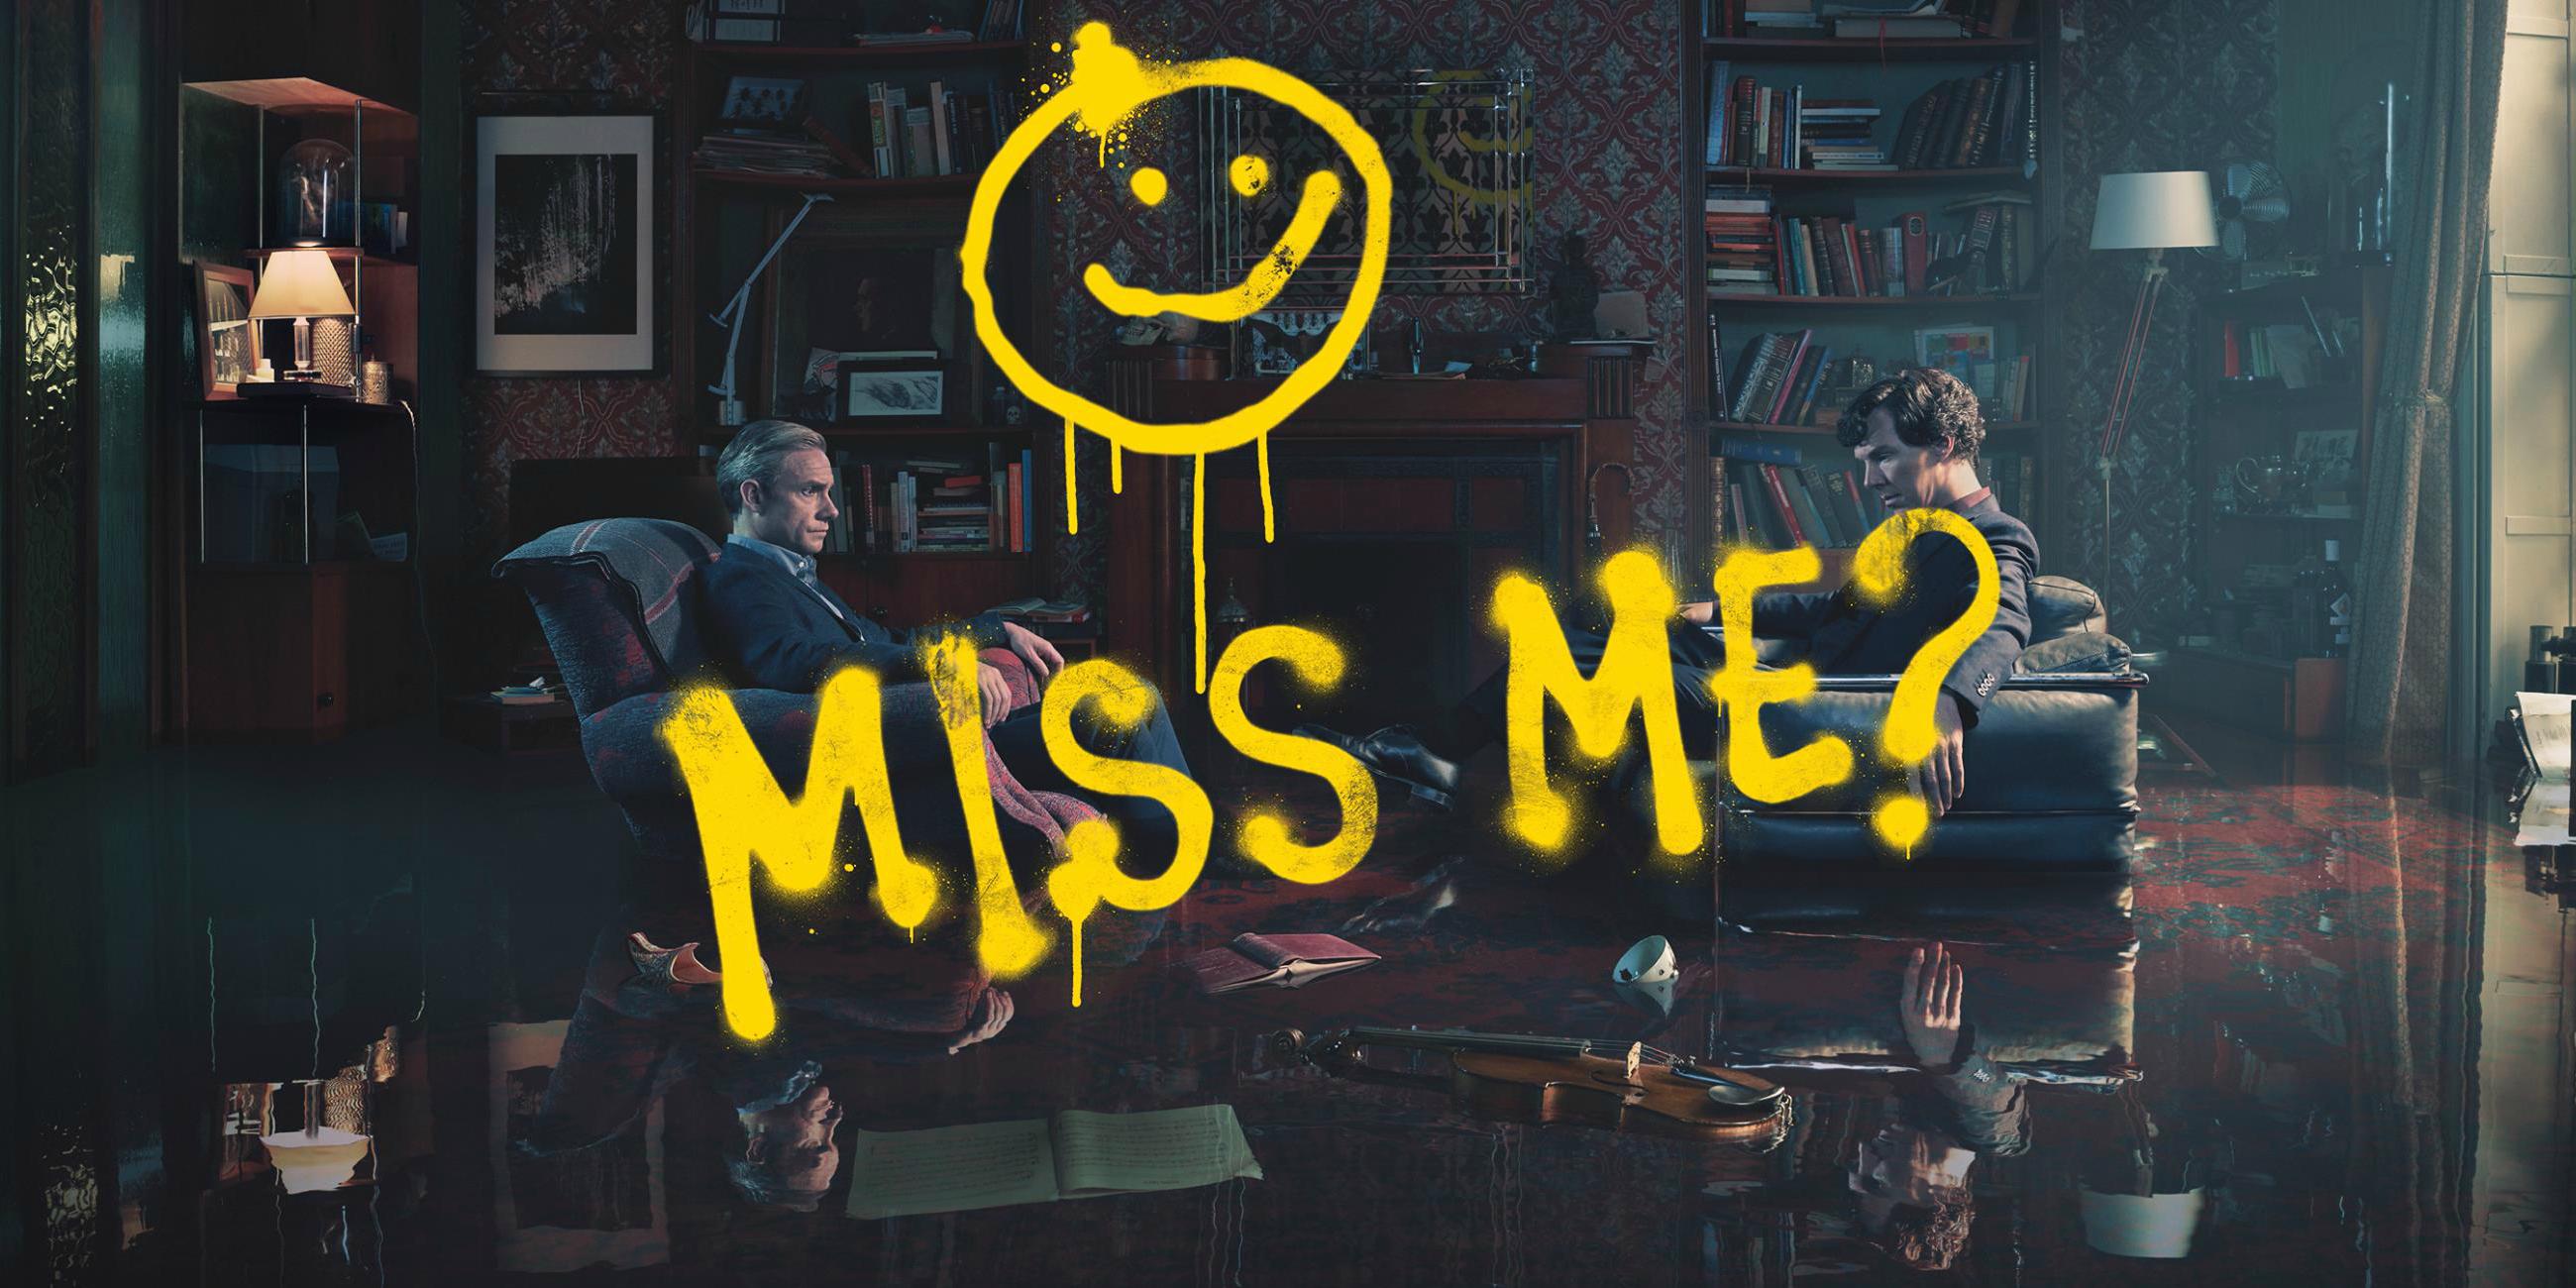 Sherlock Season 4 Promo Teases Moriarty's Return